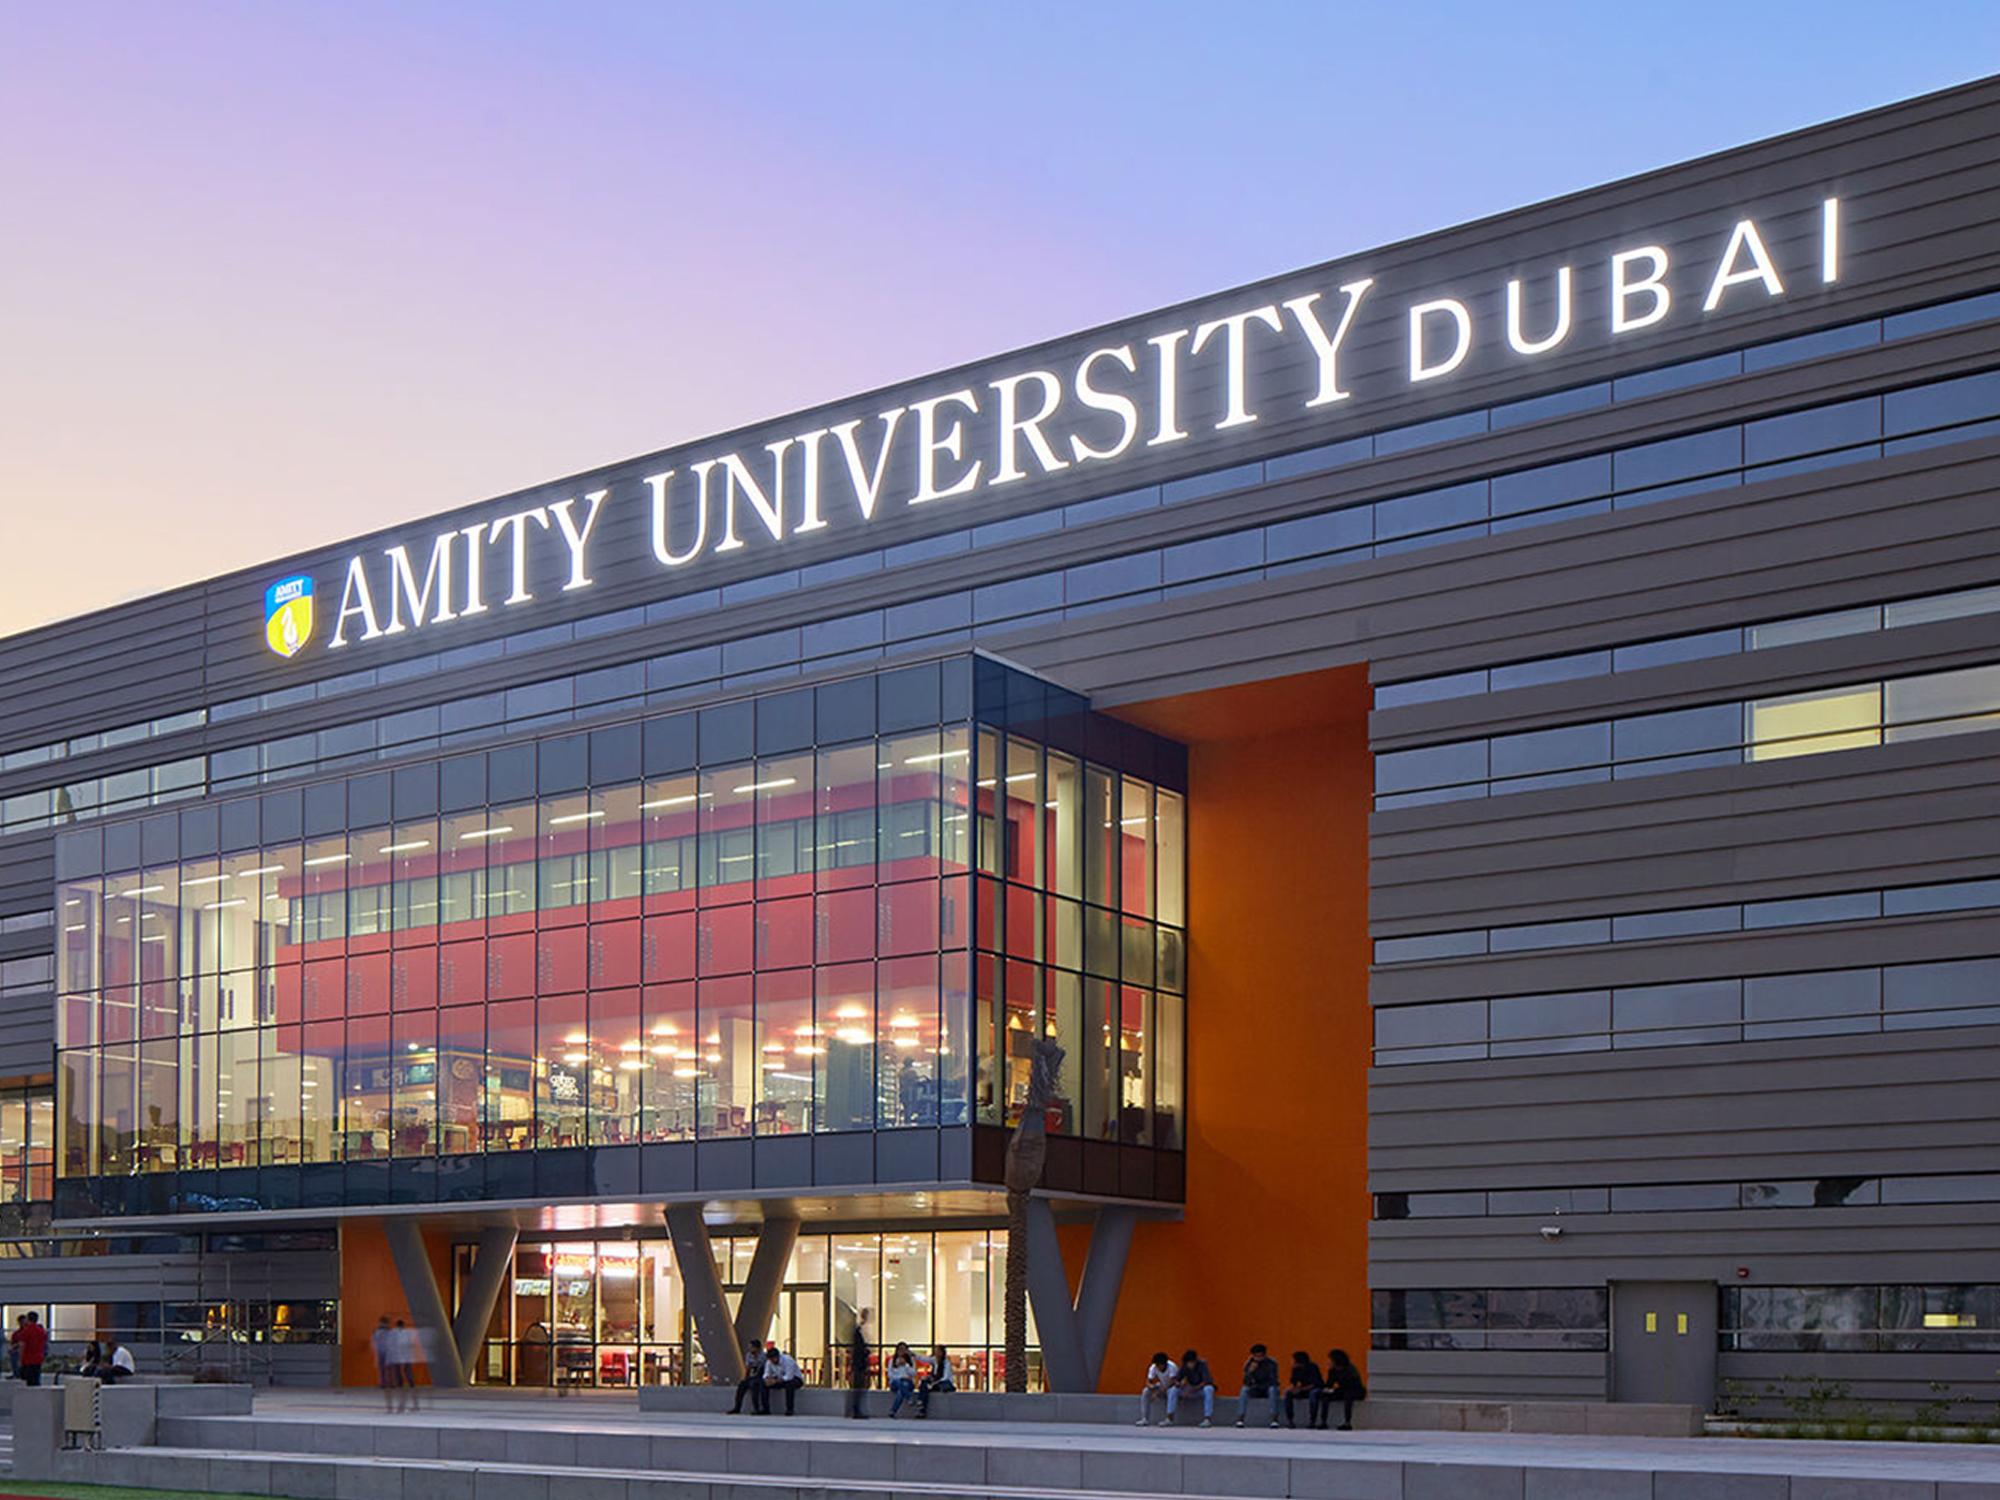 Amity University Dubai Bmtc